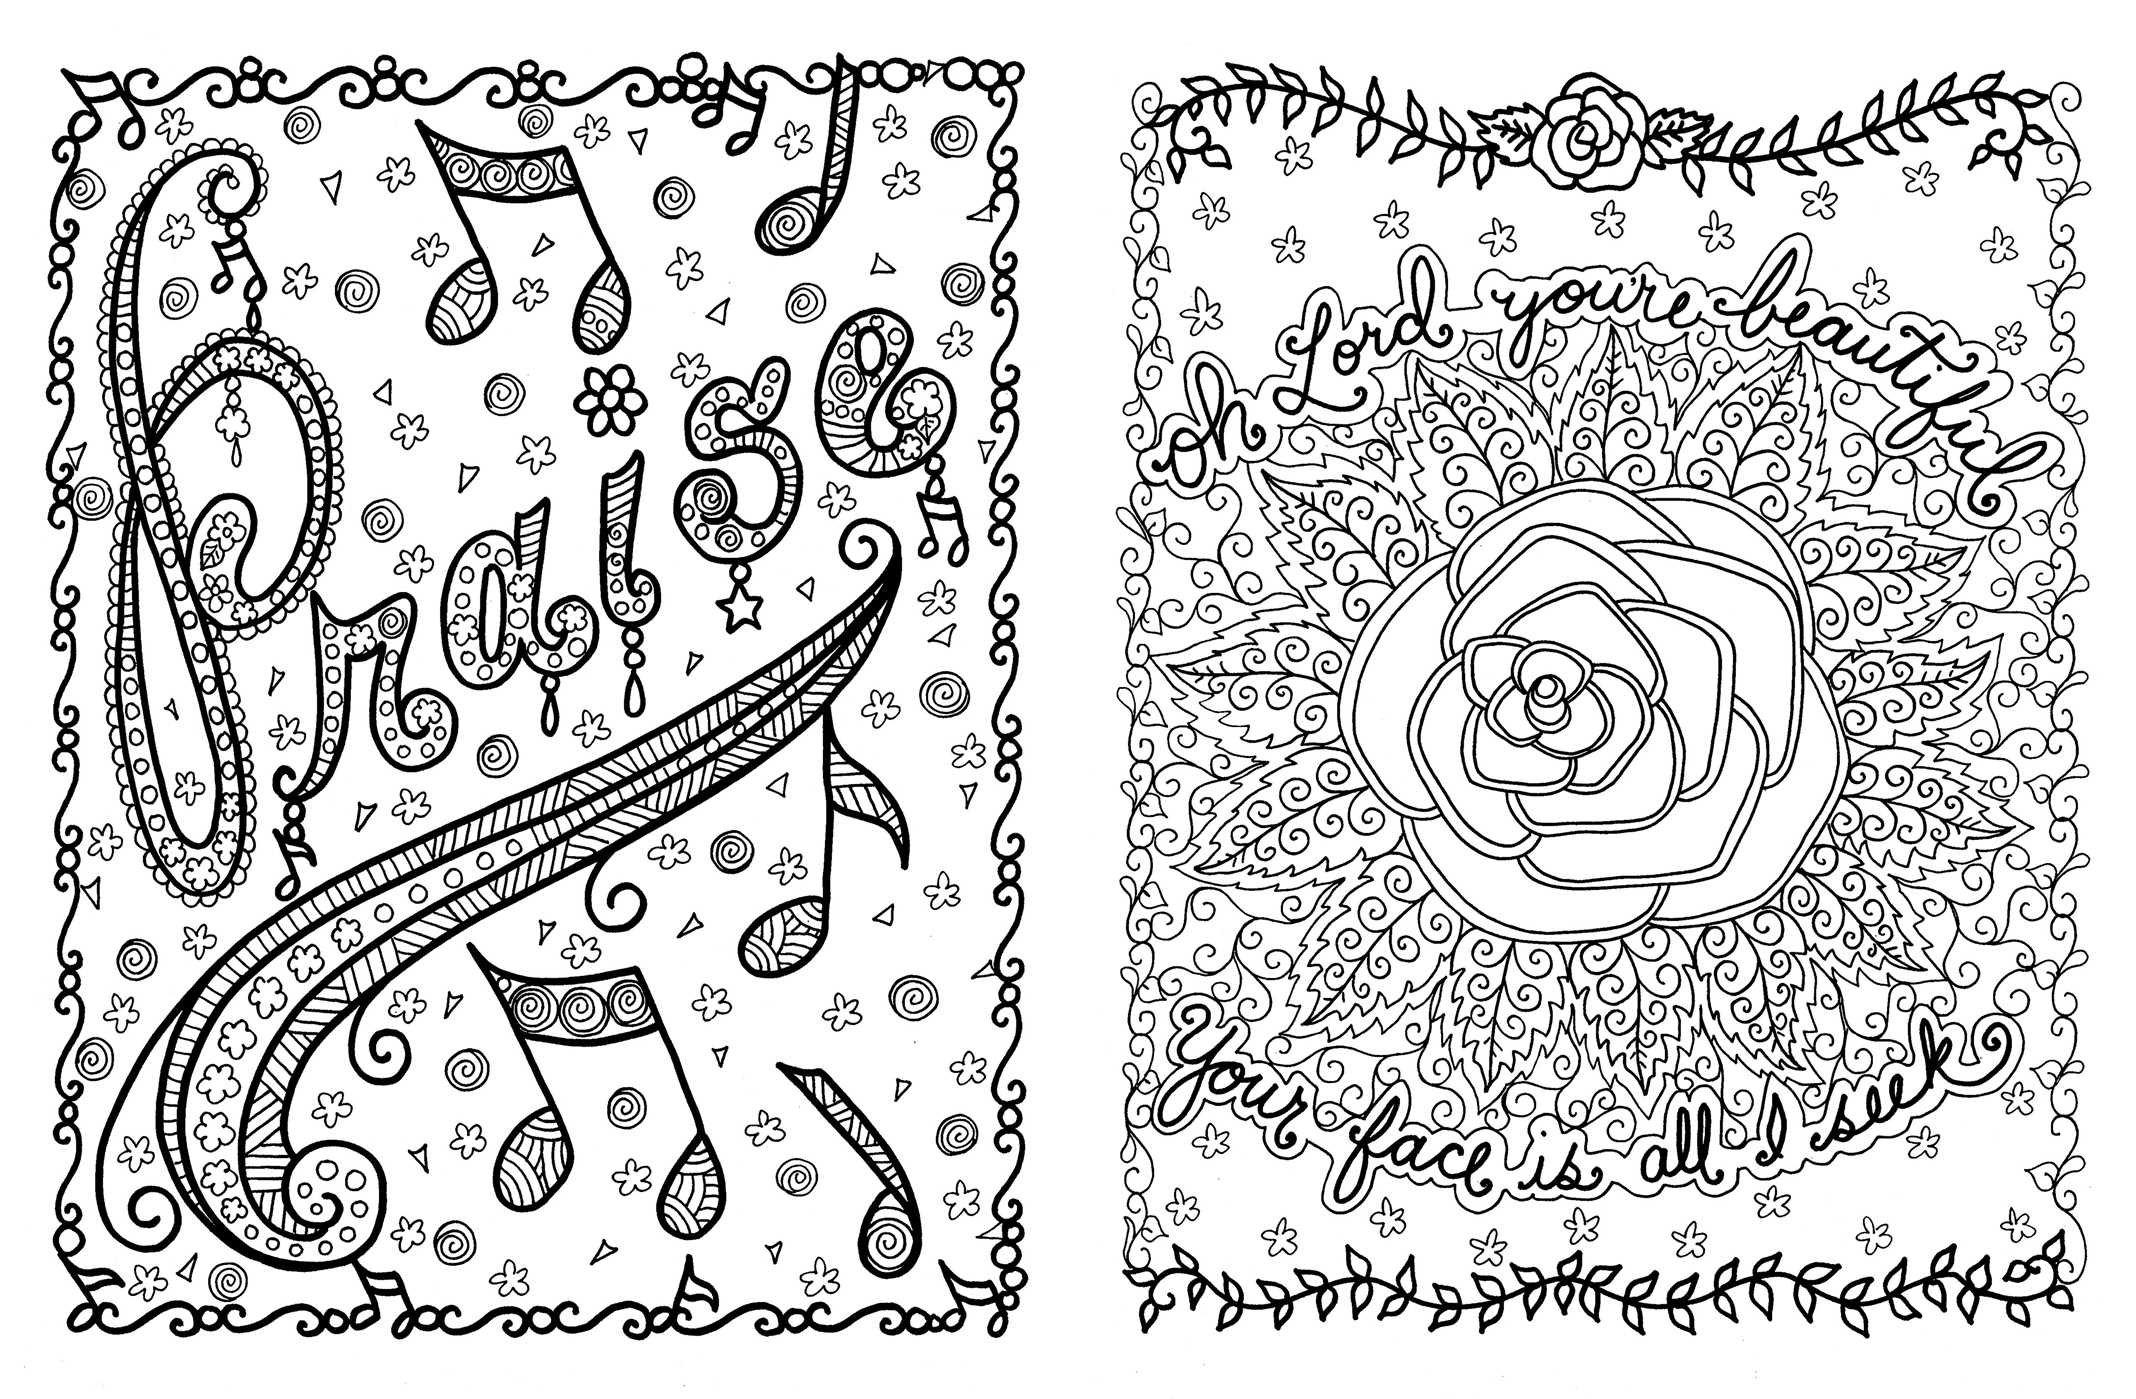 Amazon com posh adult coloring book hymnspirations for joy praise posh coloring books 0050837354845 deborah muller books